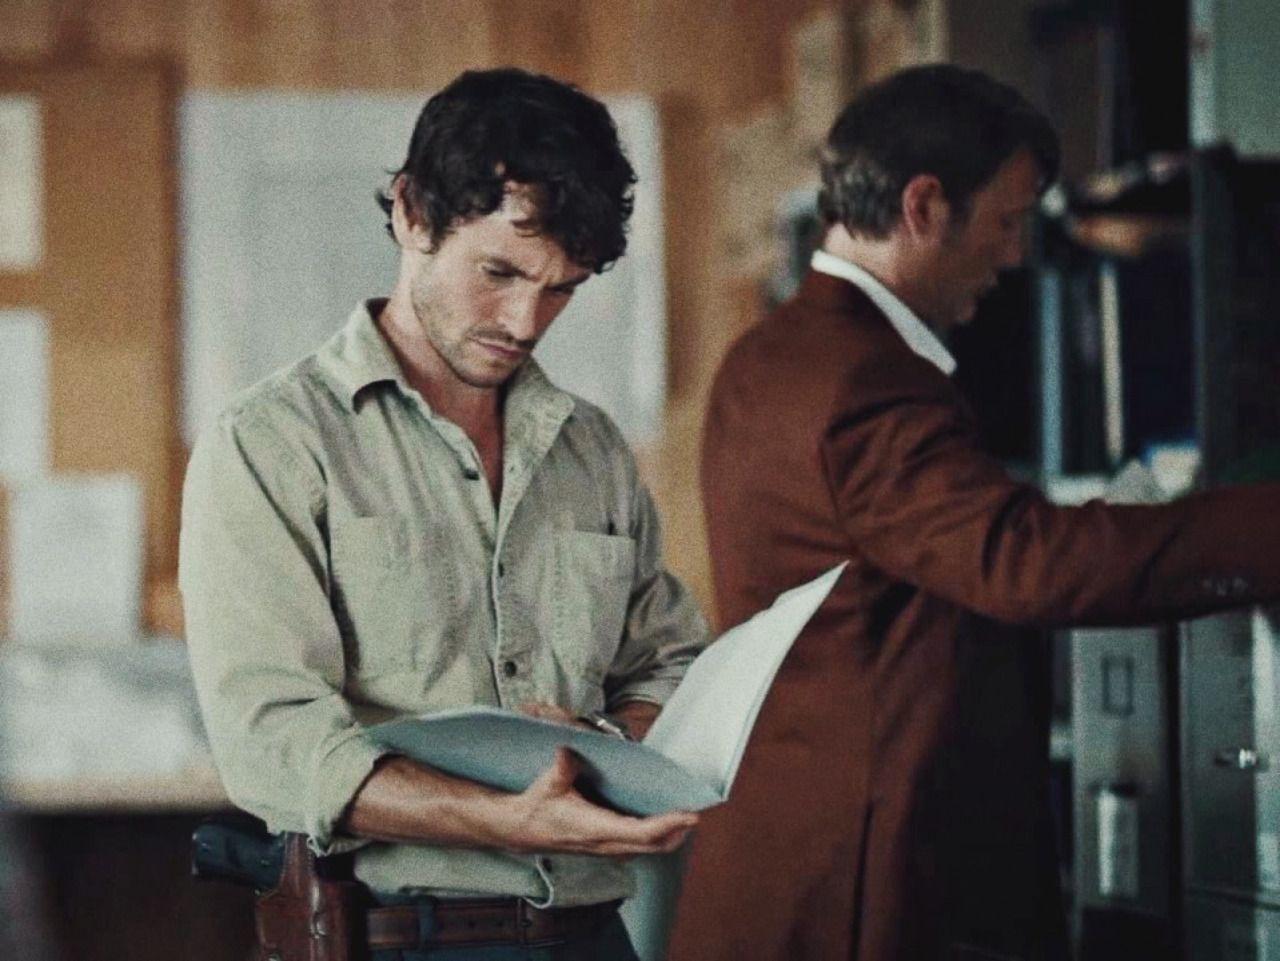 Pin by Aneta on Hugh Dancy | Hugh dancy, Hannibal series